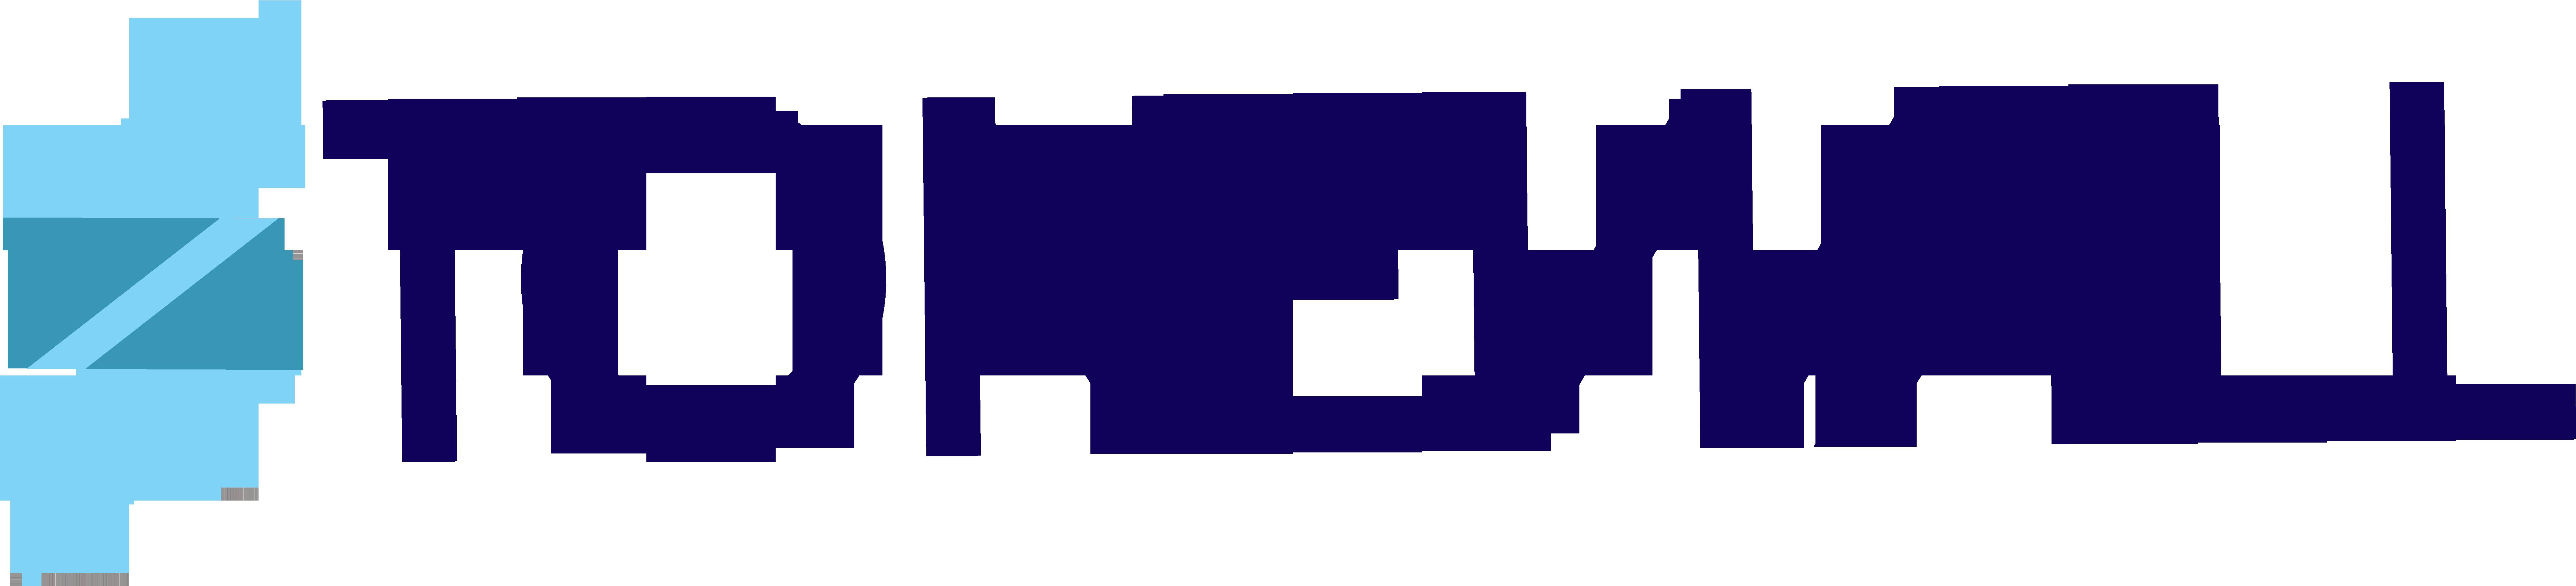 StoneWall Logo - Blue